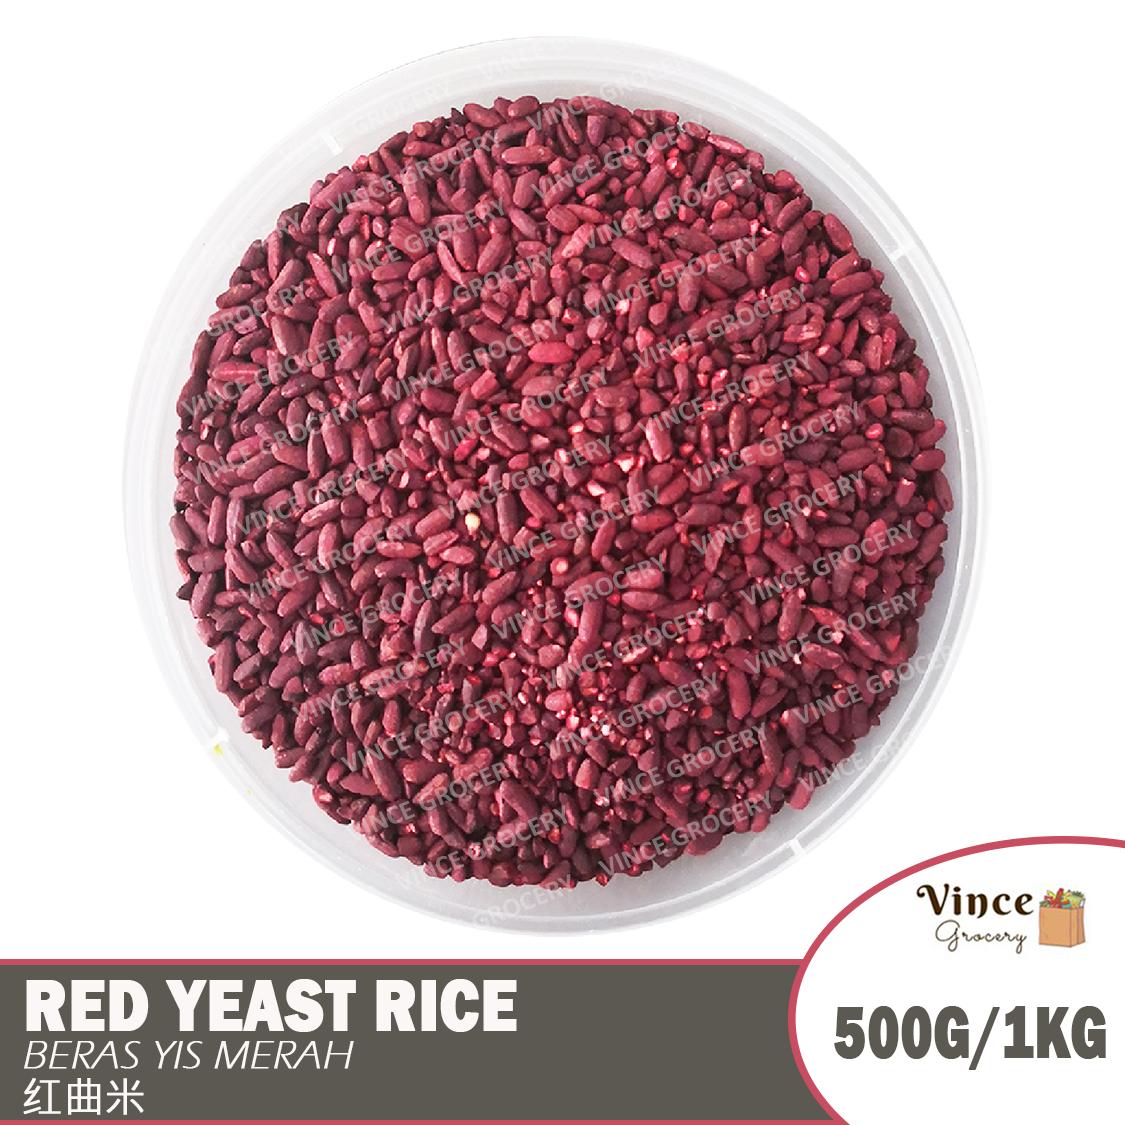 Red Yeast Rice   Beras Yis Merah   红曲米 500G